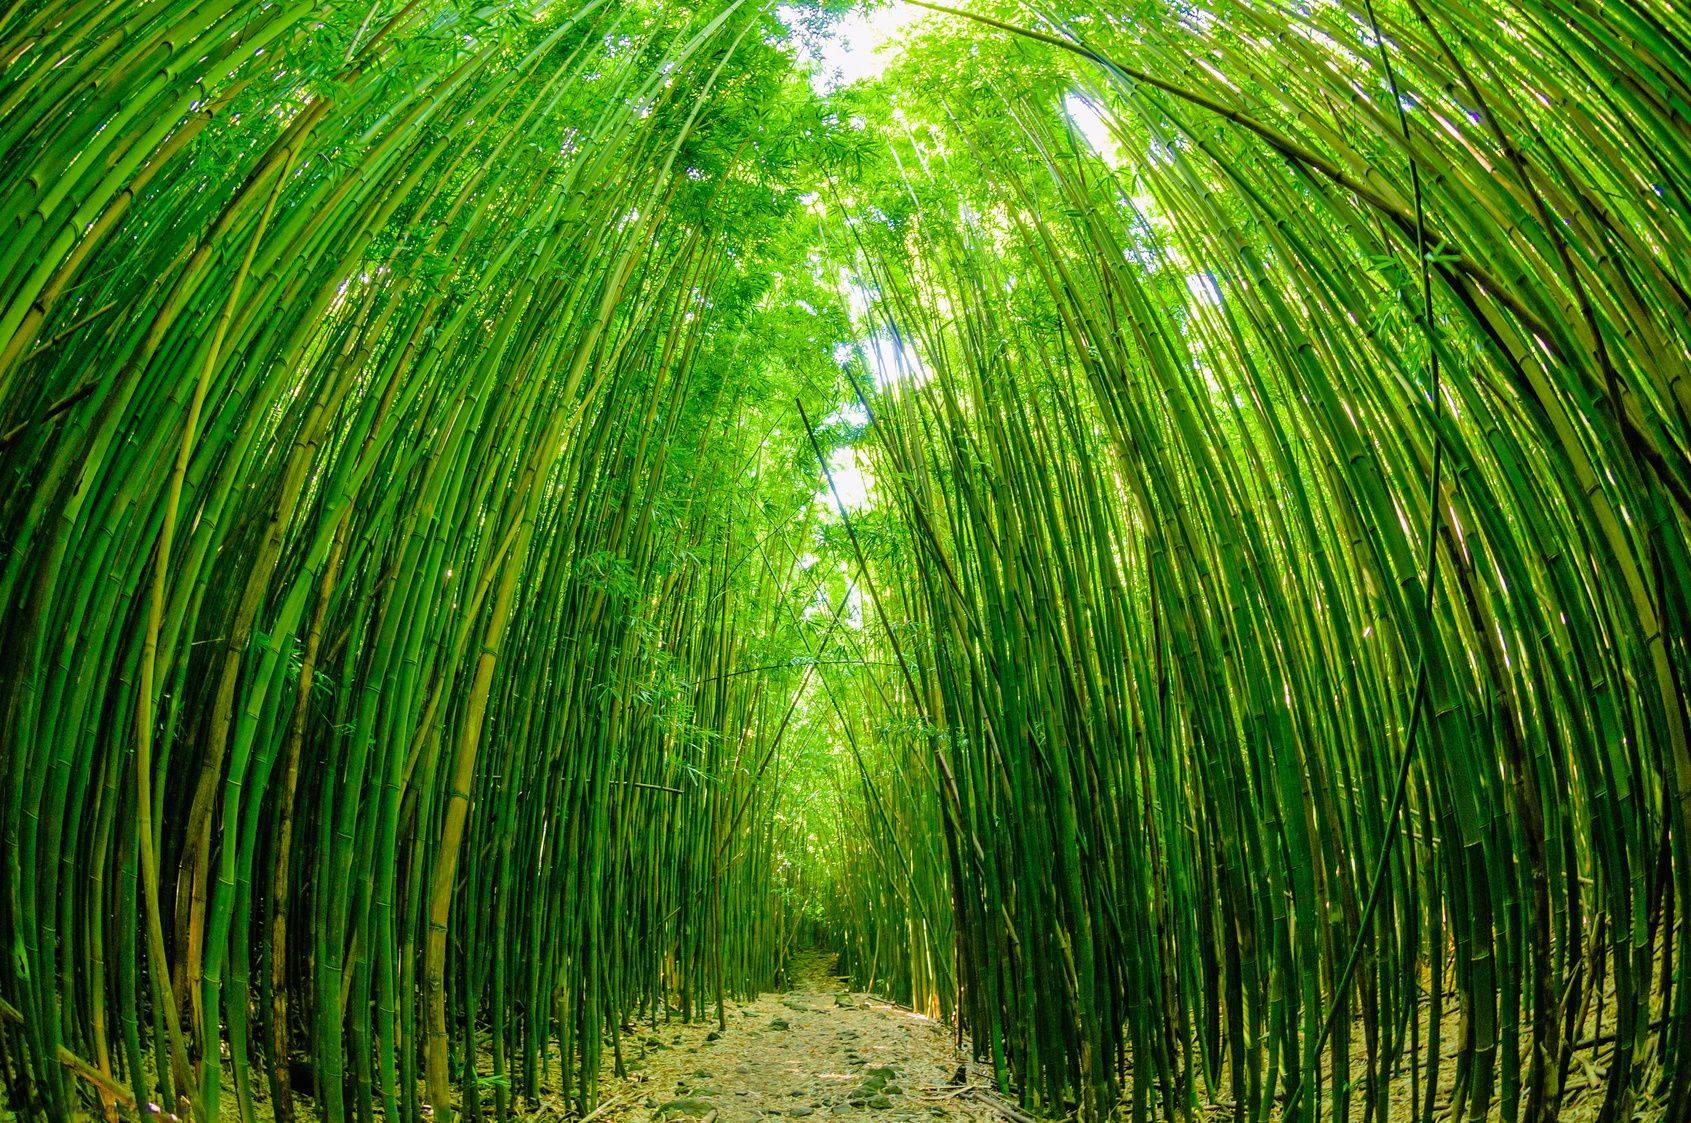 Haleakala National Park Bamboo Forest